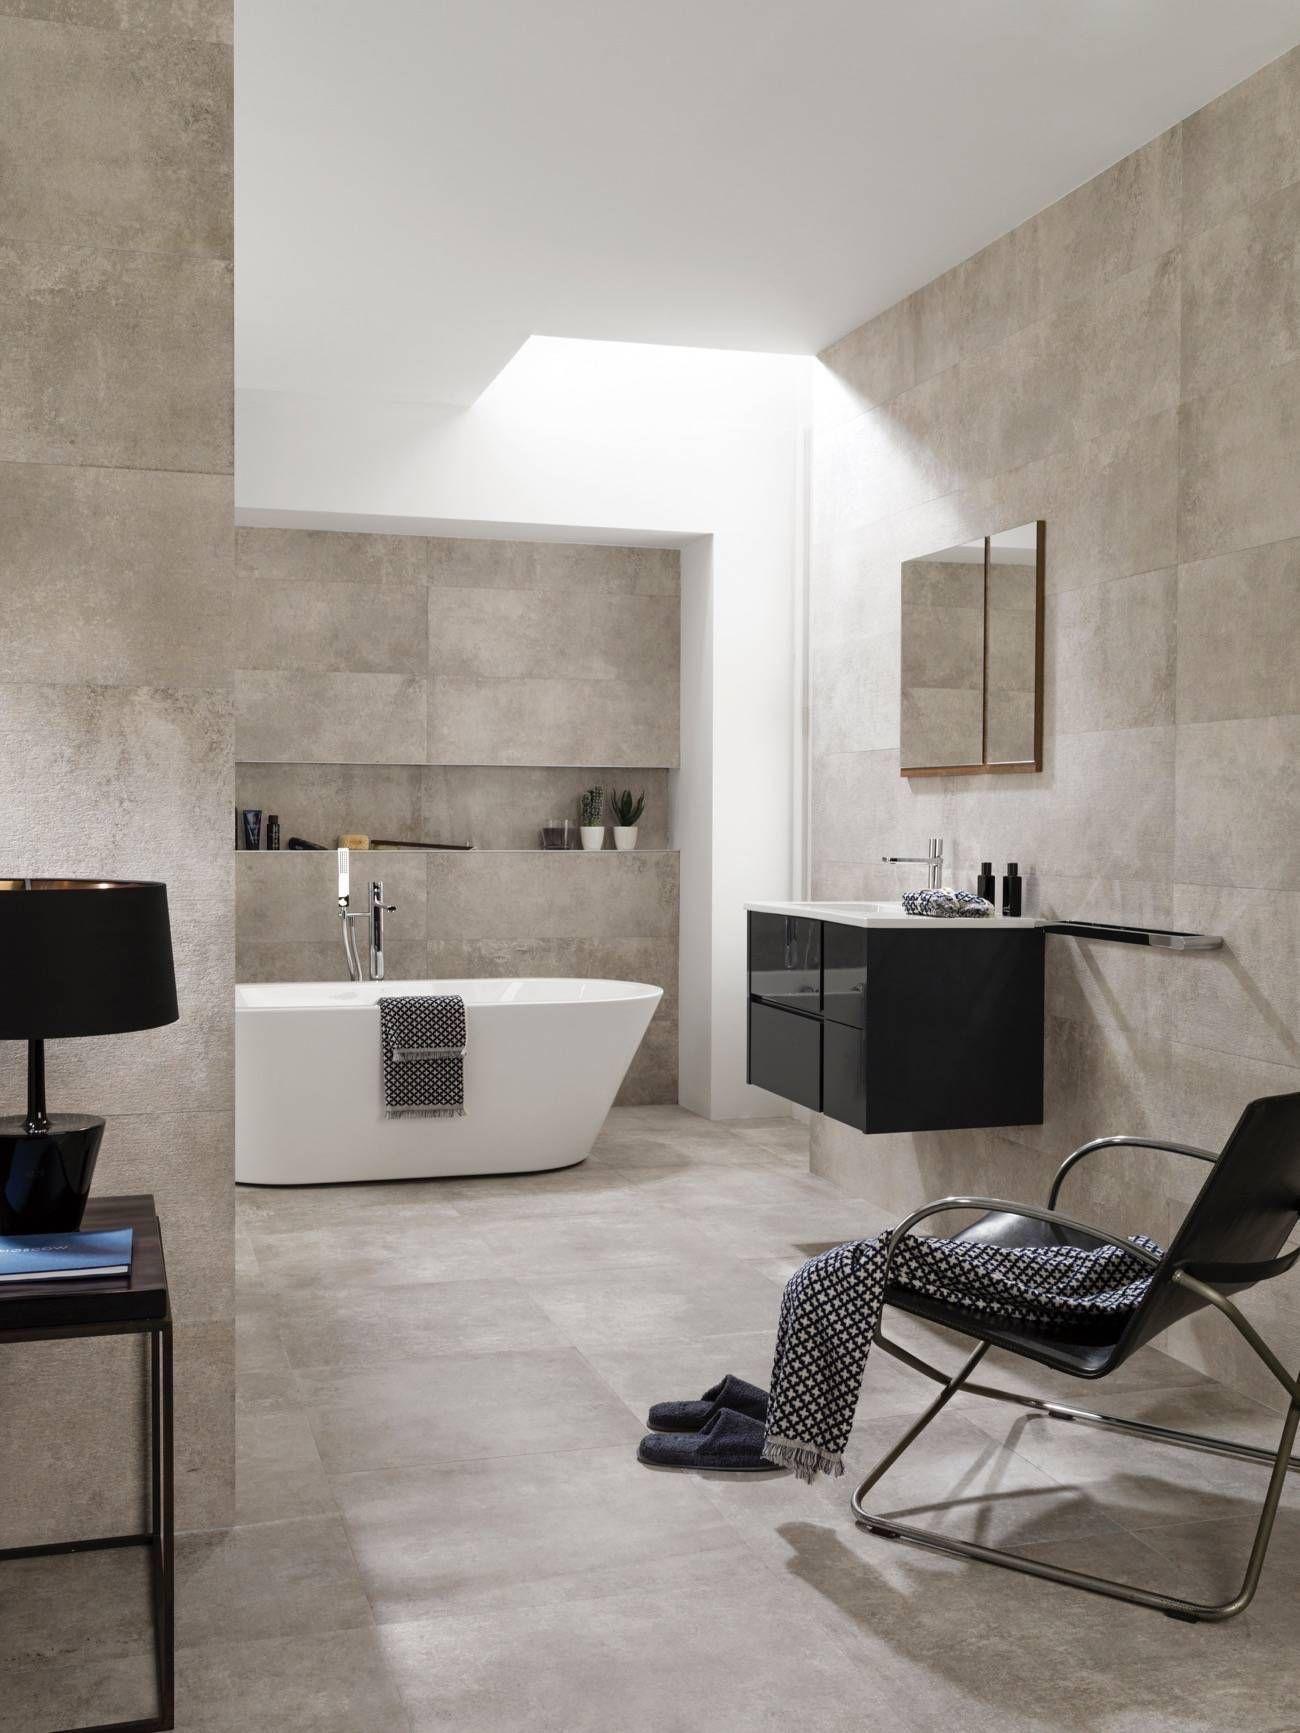 system pool porcelanosa - Buscar con Google | Powder room ...